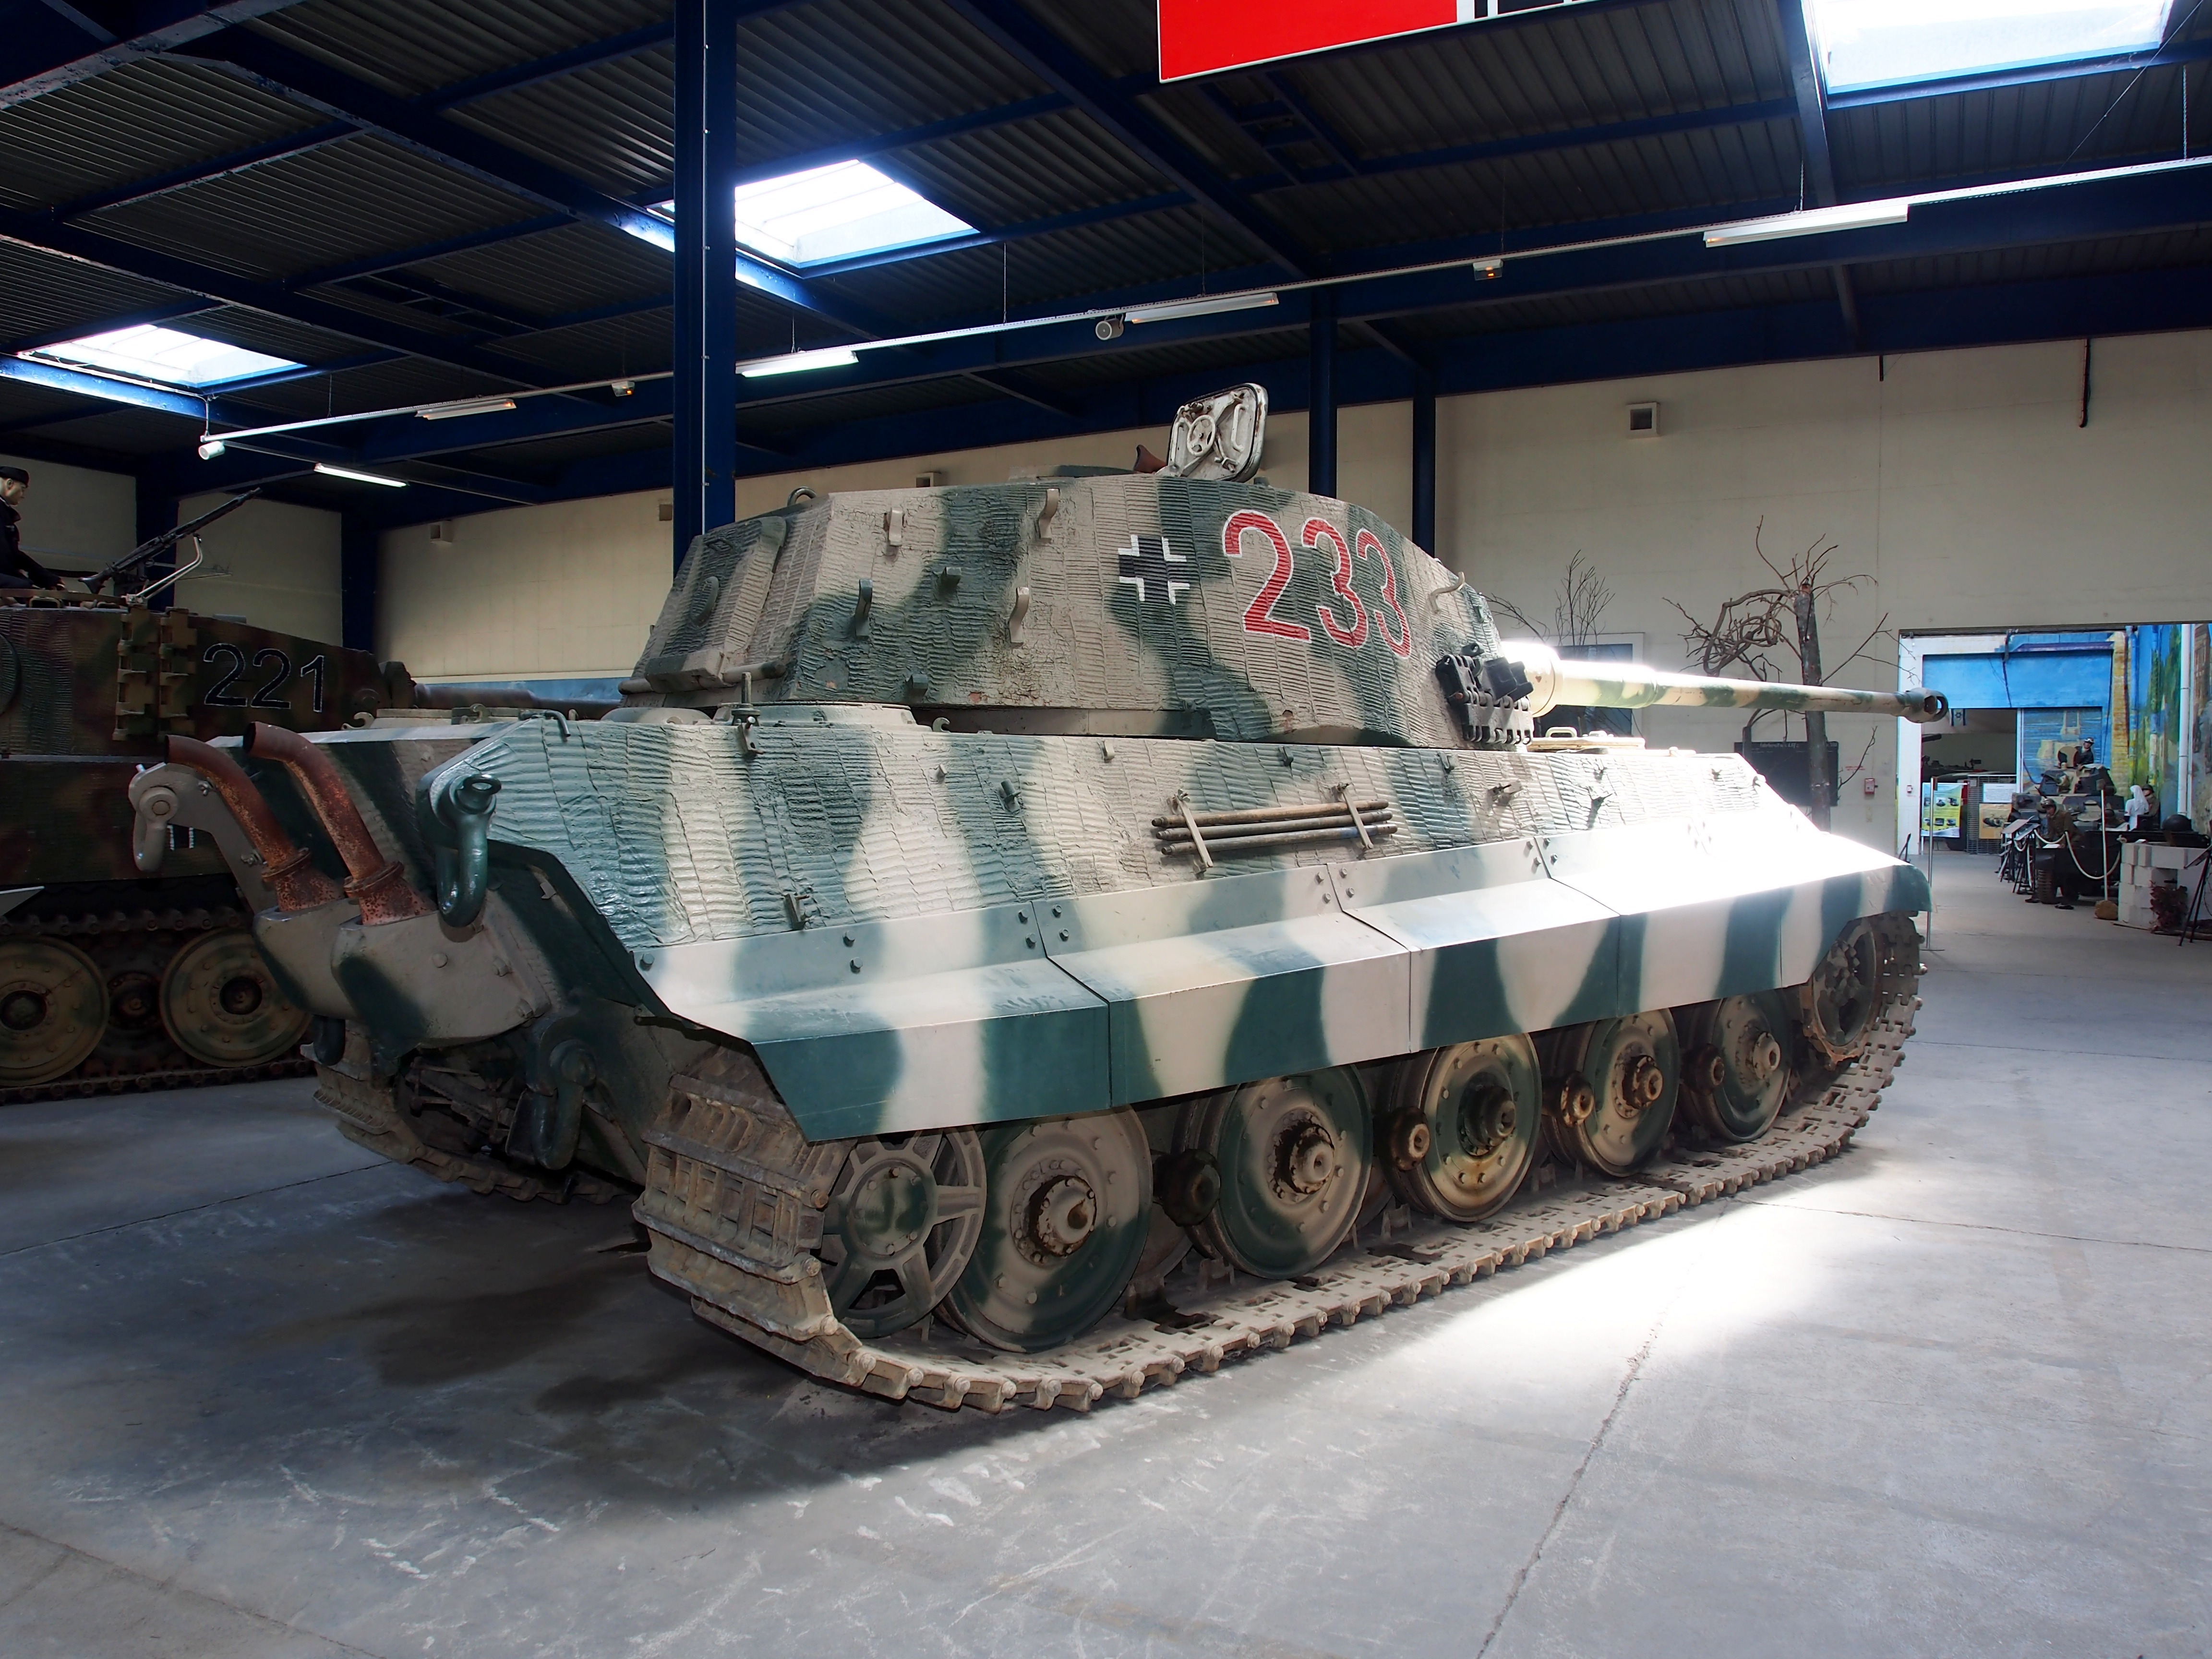 file panzerkampfwagen vi ausf b tiger ii tiger b k nigstiger sd kfz 182 tanks in the. Black Bedroom Furniture Sets. Home Design Ideas